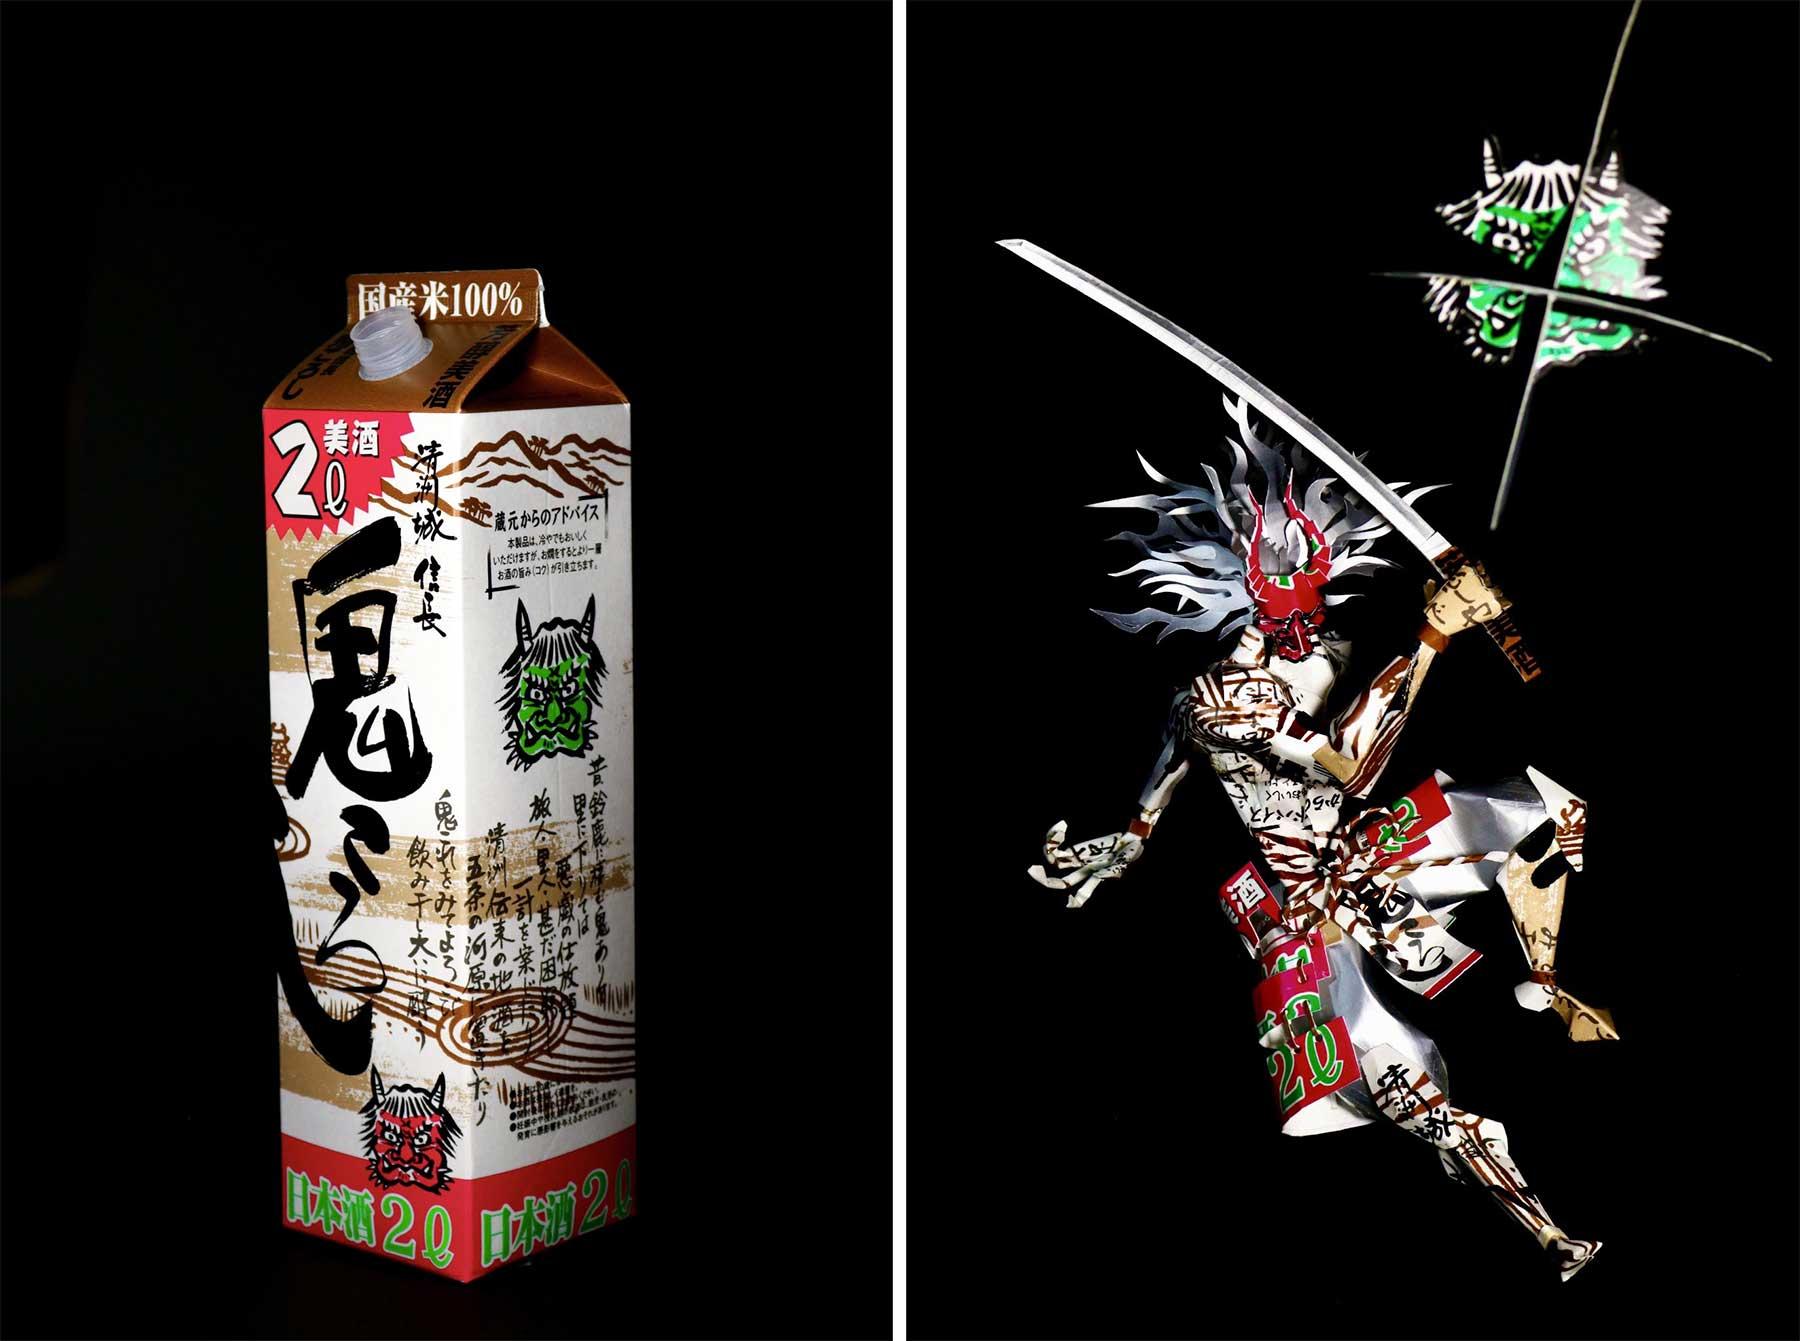 Neue Verpackungs-Skulpturen von Haruki verpackungsskulpturen-haruki-2020_02